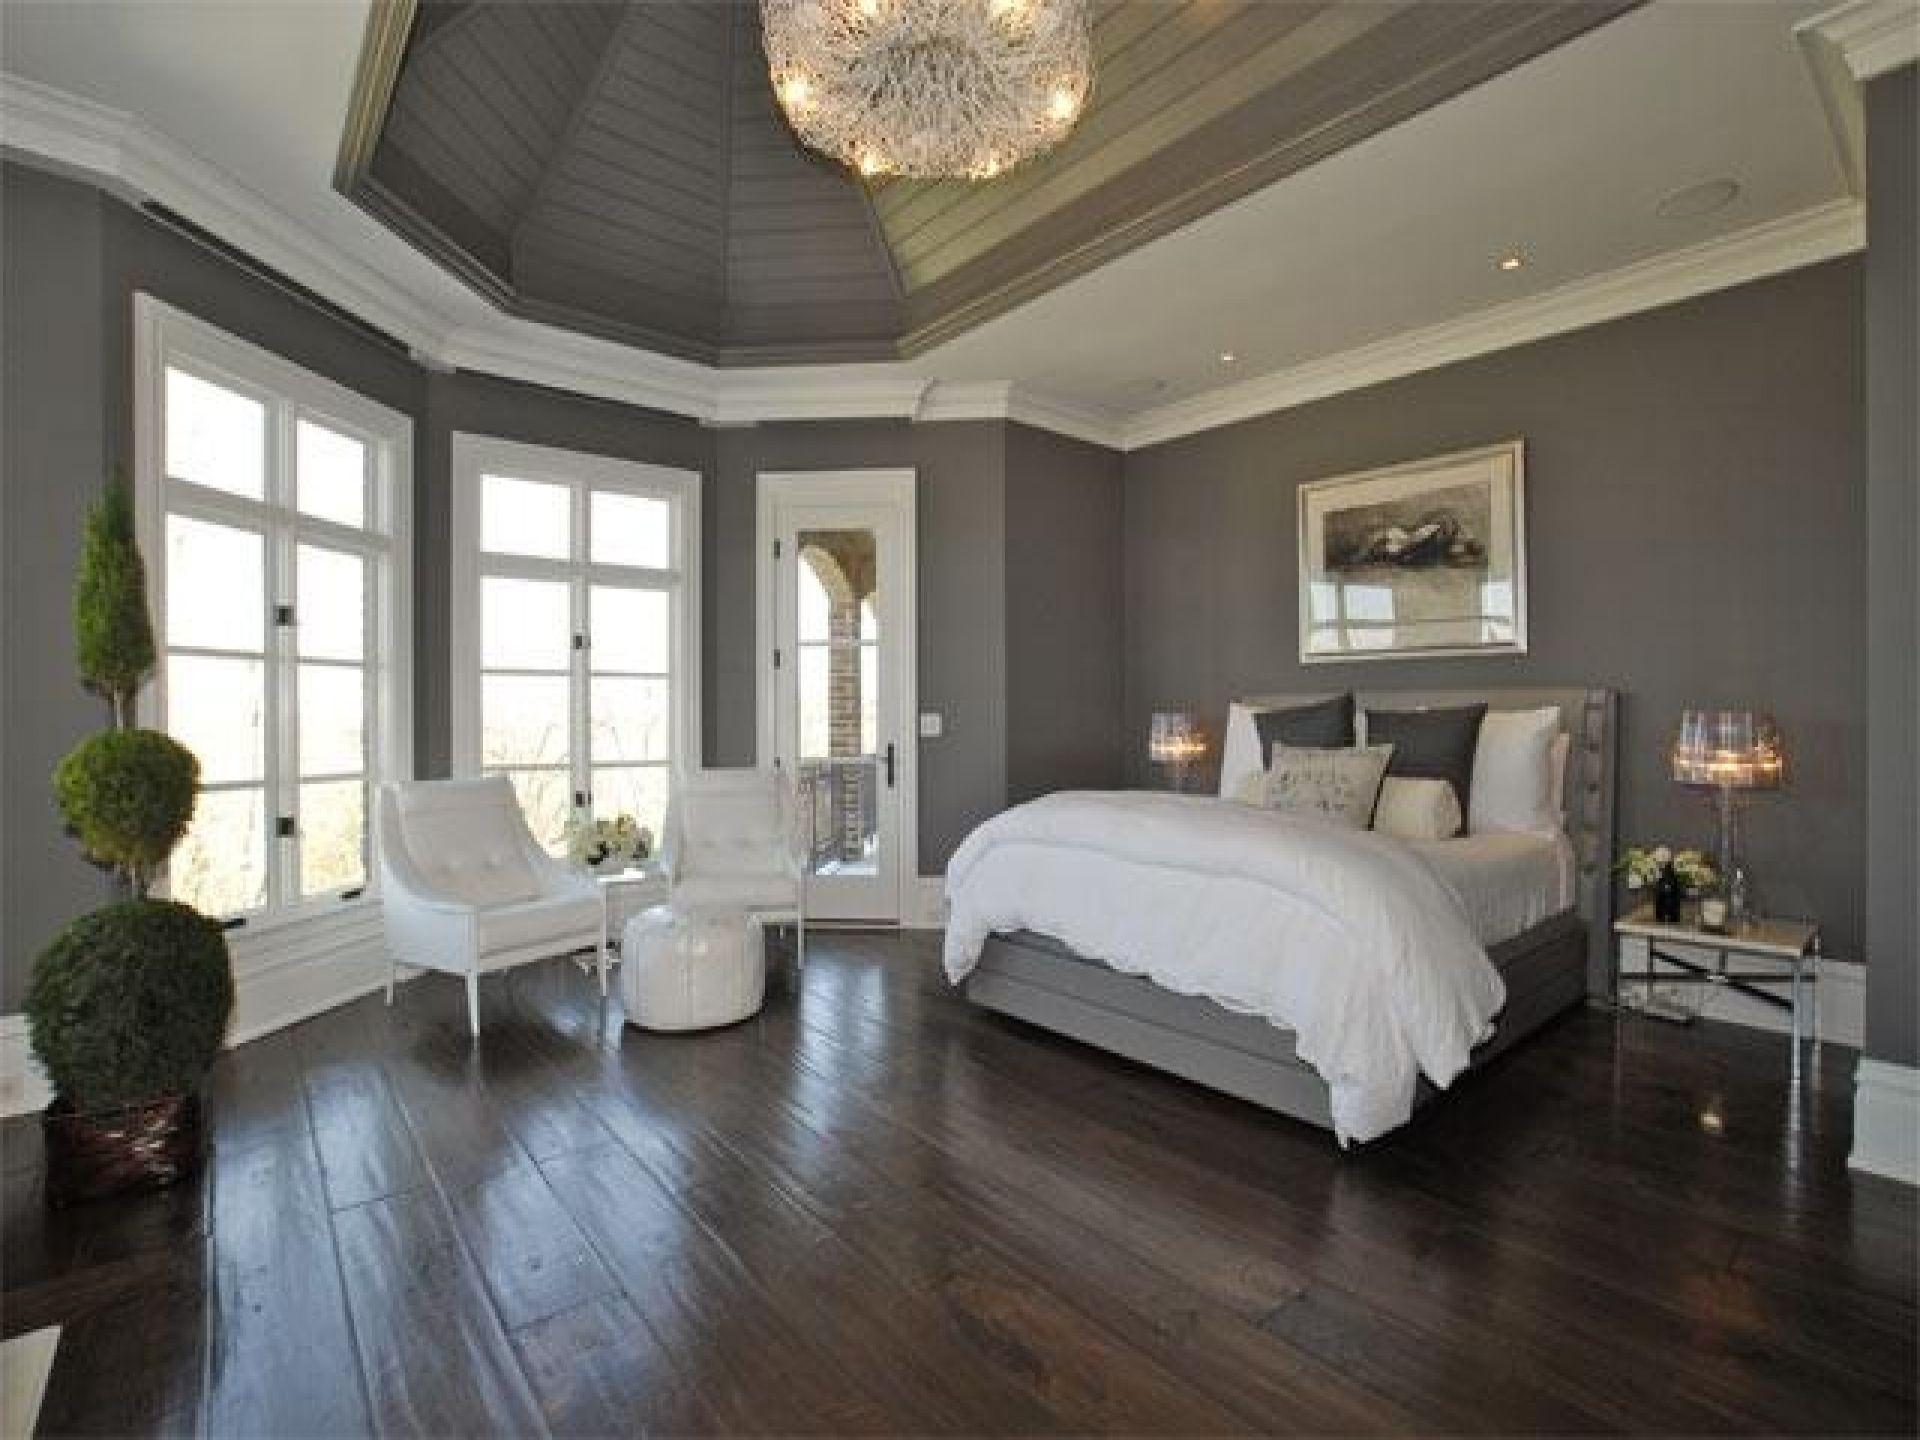 Wood Floor Bedrooms Google Search Diy Home Decor